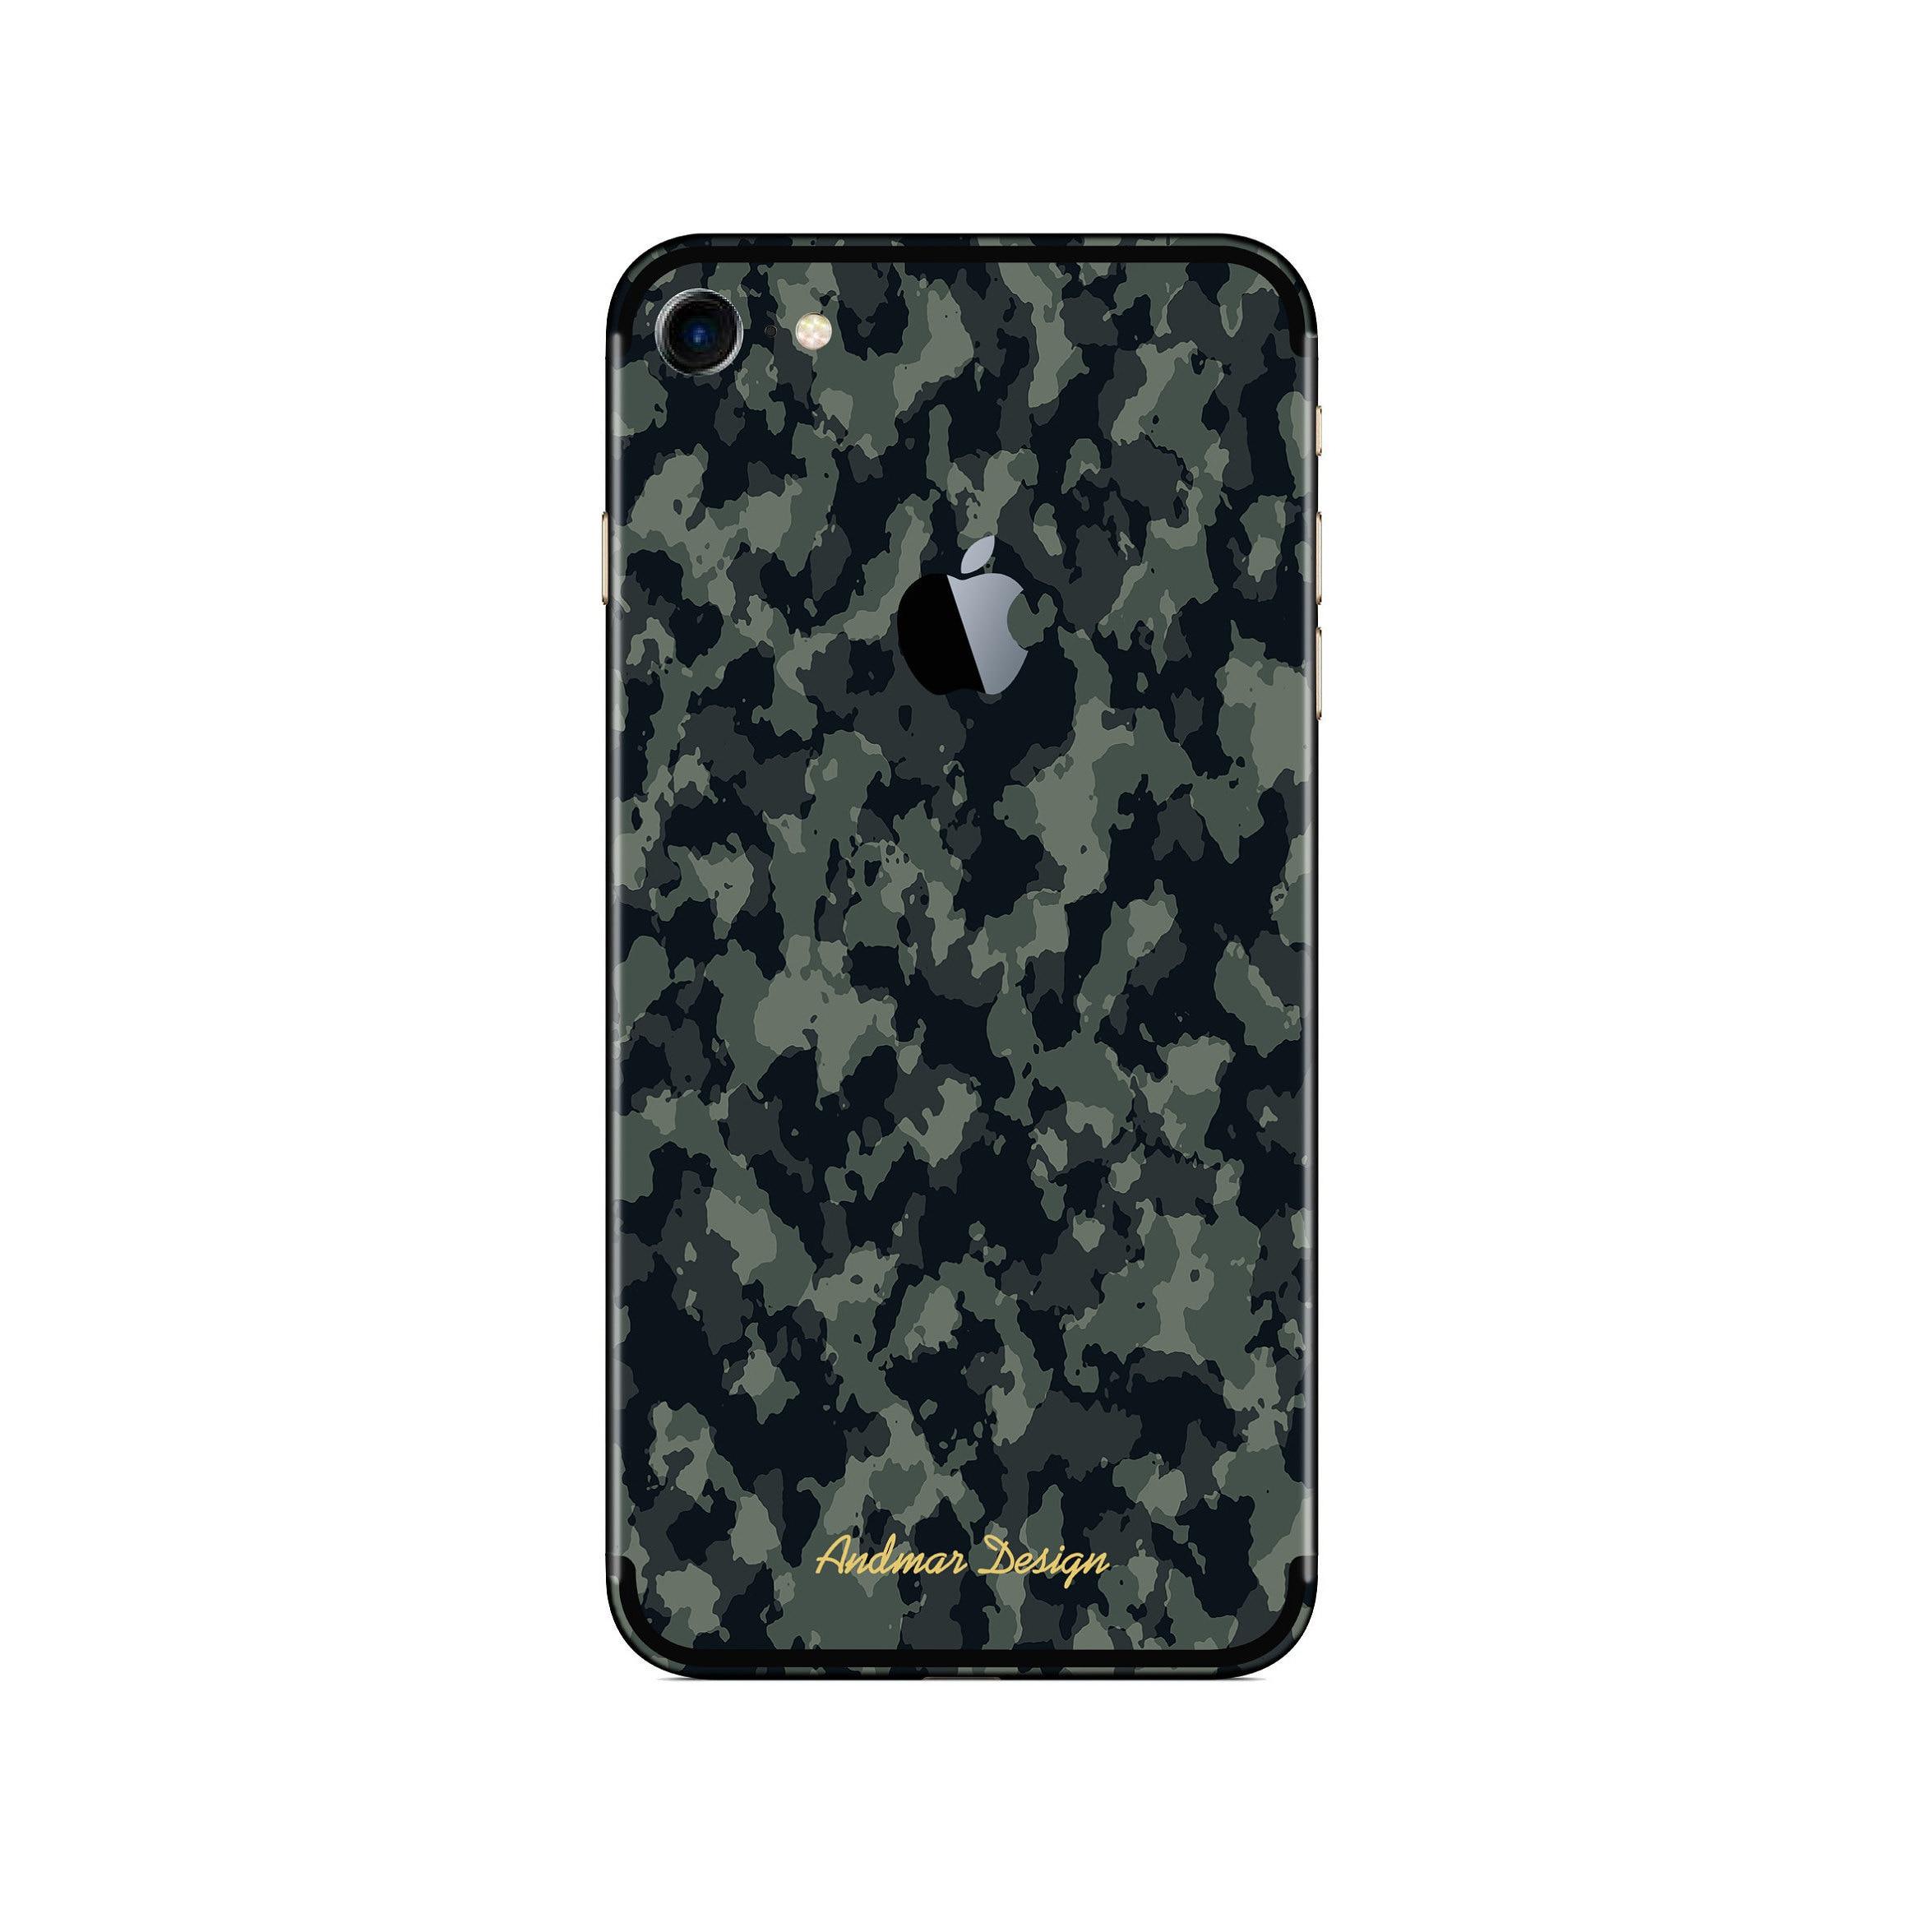 big sale 0429f 5d95d Camo Camouflage Black Green Grey iPhone Skin Decal Iphone 6 6S 7 PLUS 7 8  iPhone X PLUS Iphone Skin Cover Sticker Decal Phone Sticker